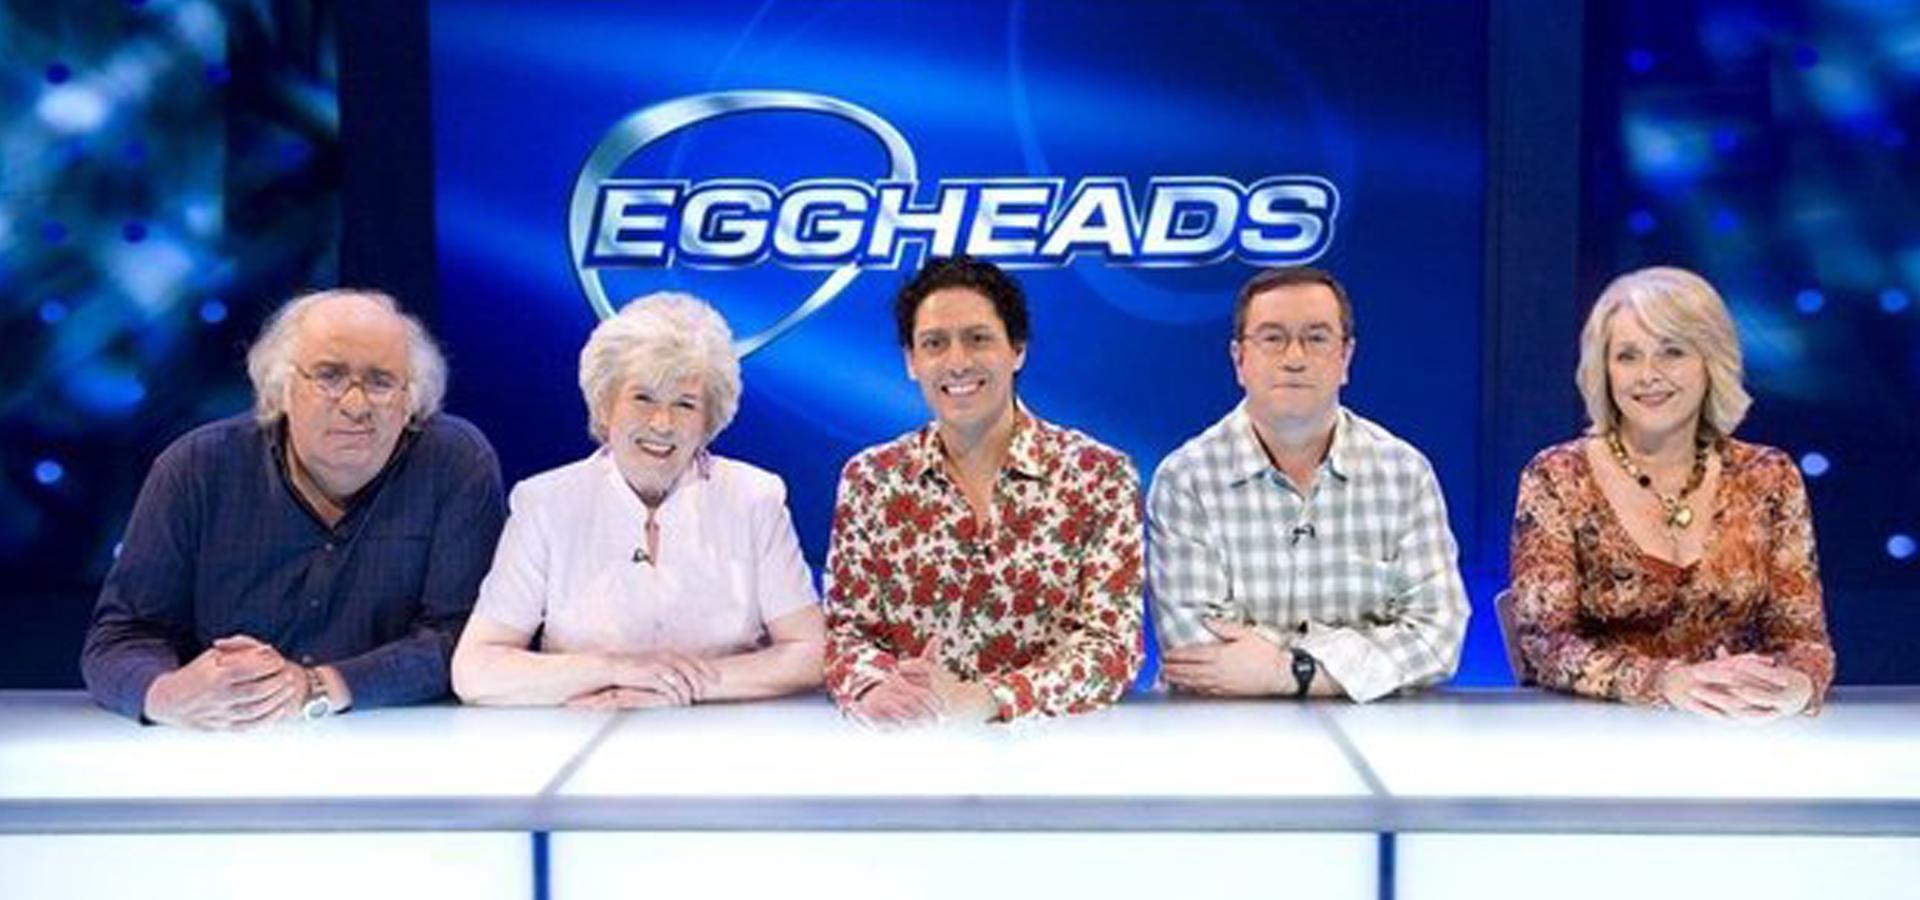 Eggheads.png